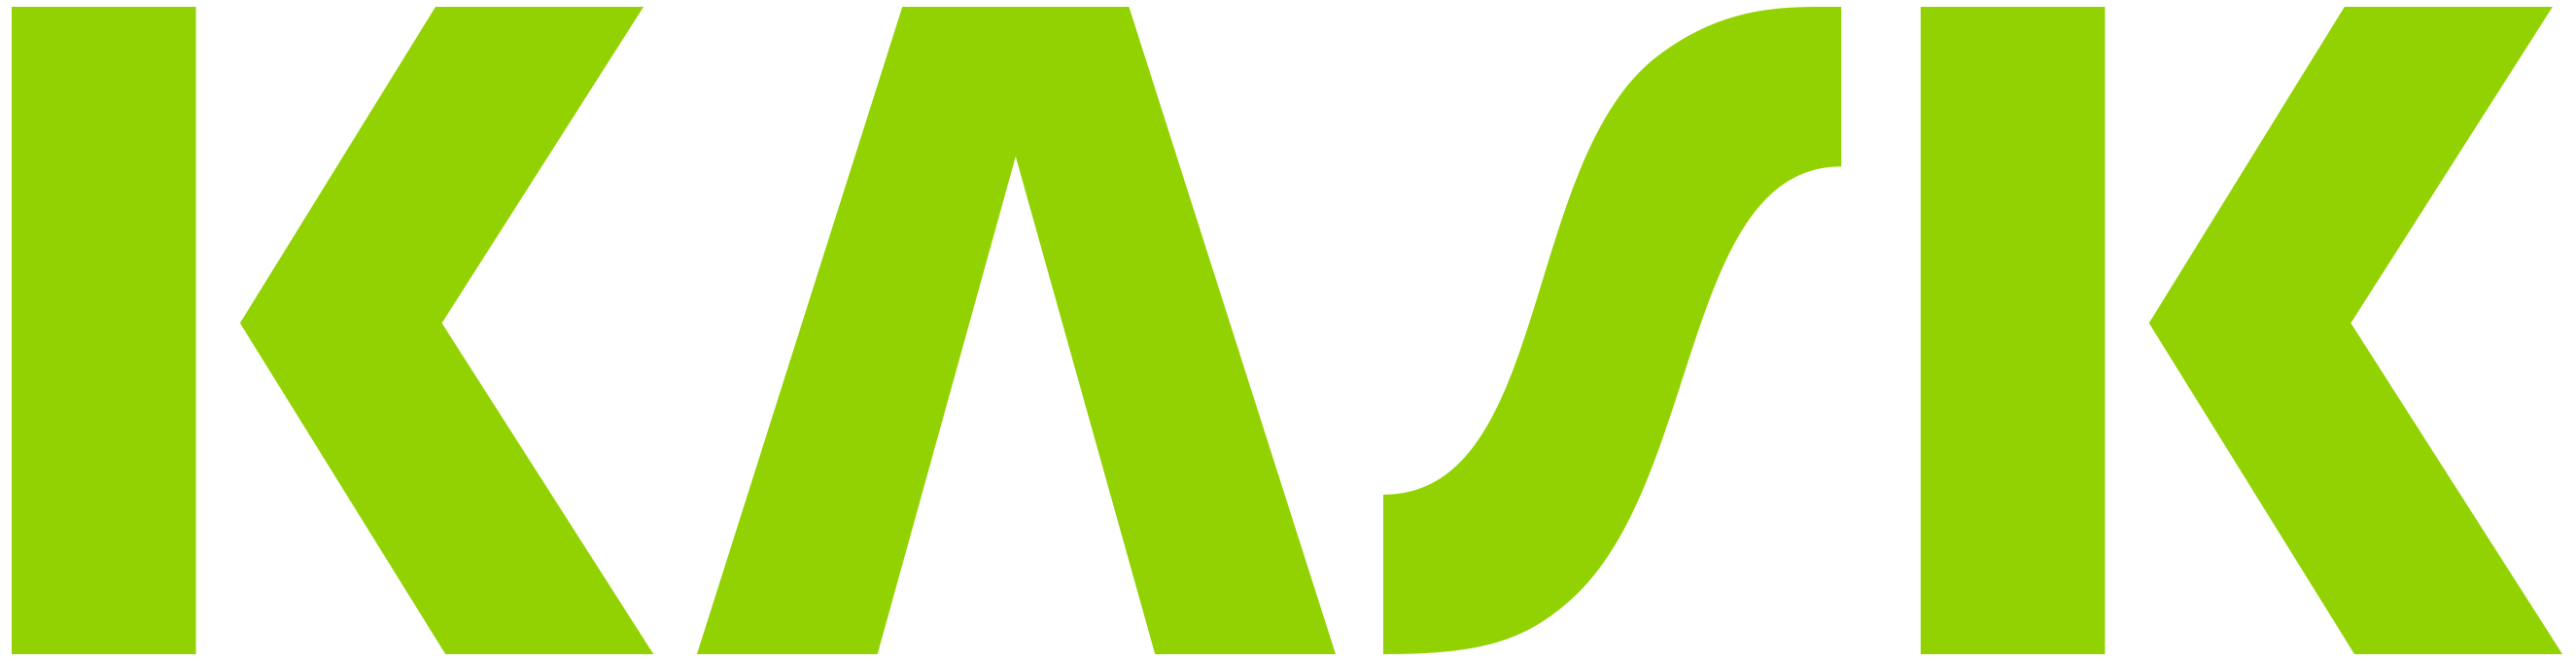 kask-logo-verde.jpg